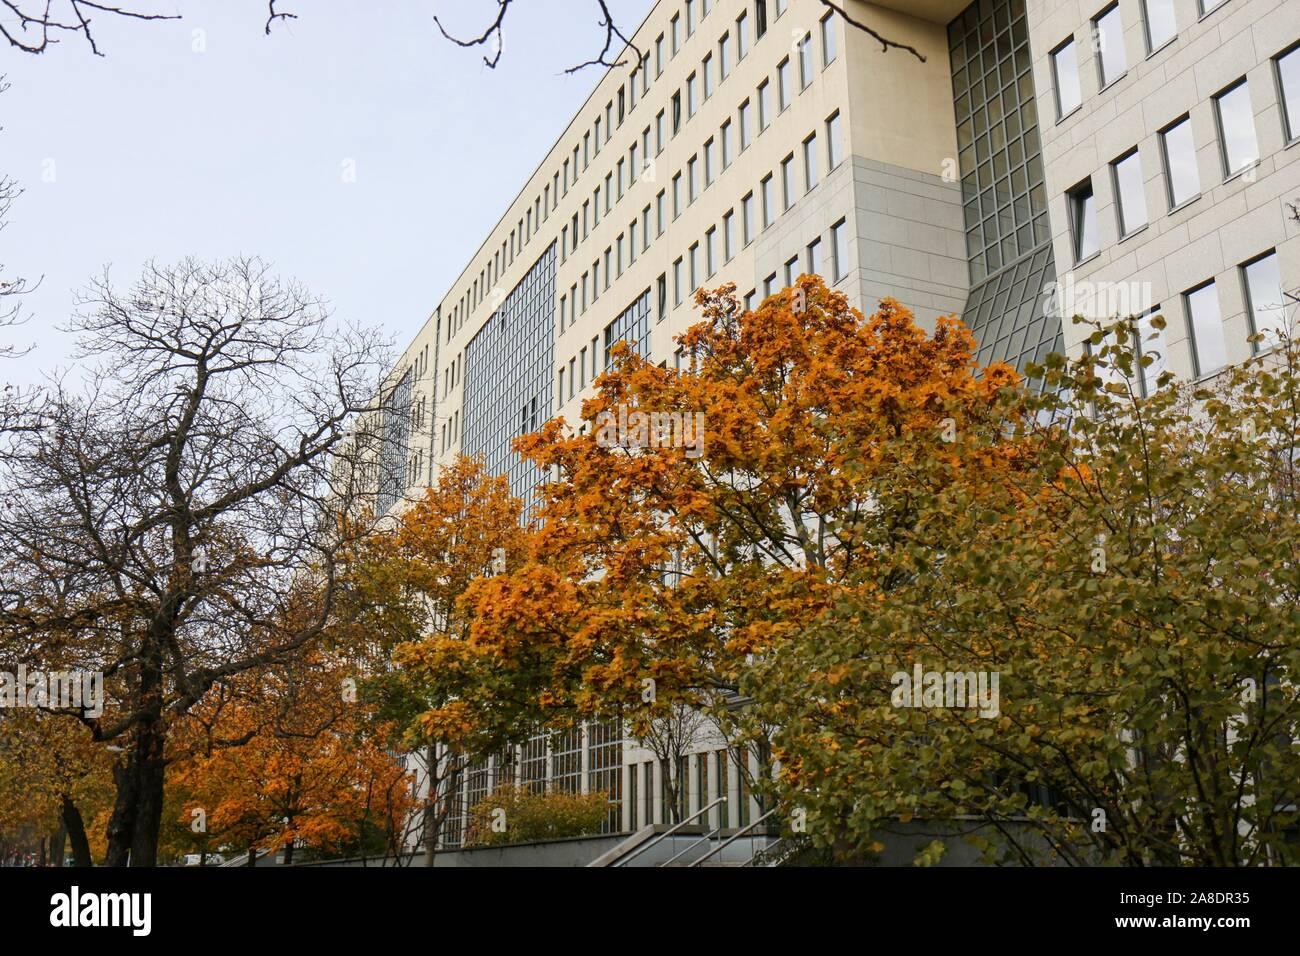 BERLIN - NOVEMBER 8, 2018: Large Deutsche Rentenversicherung / Pension Insurance Building in Kreuzberg in fall with autumn colors Stock Photo